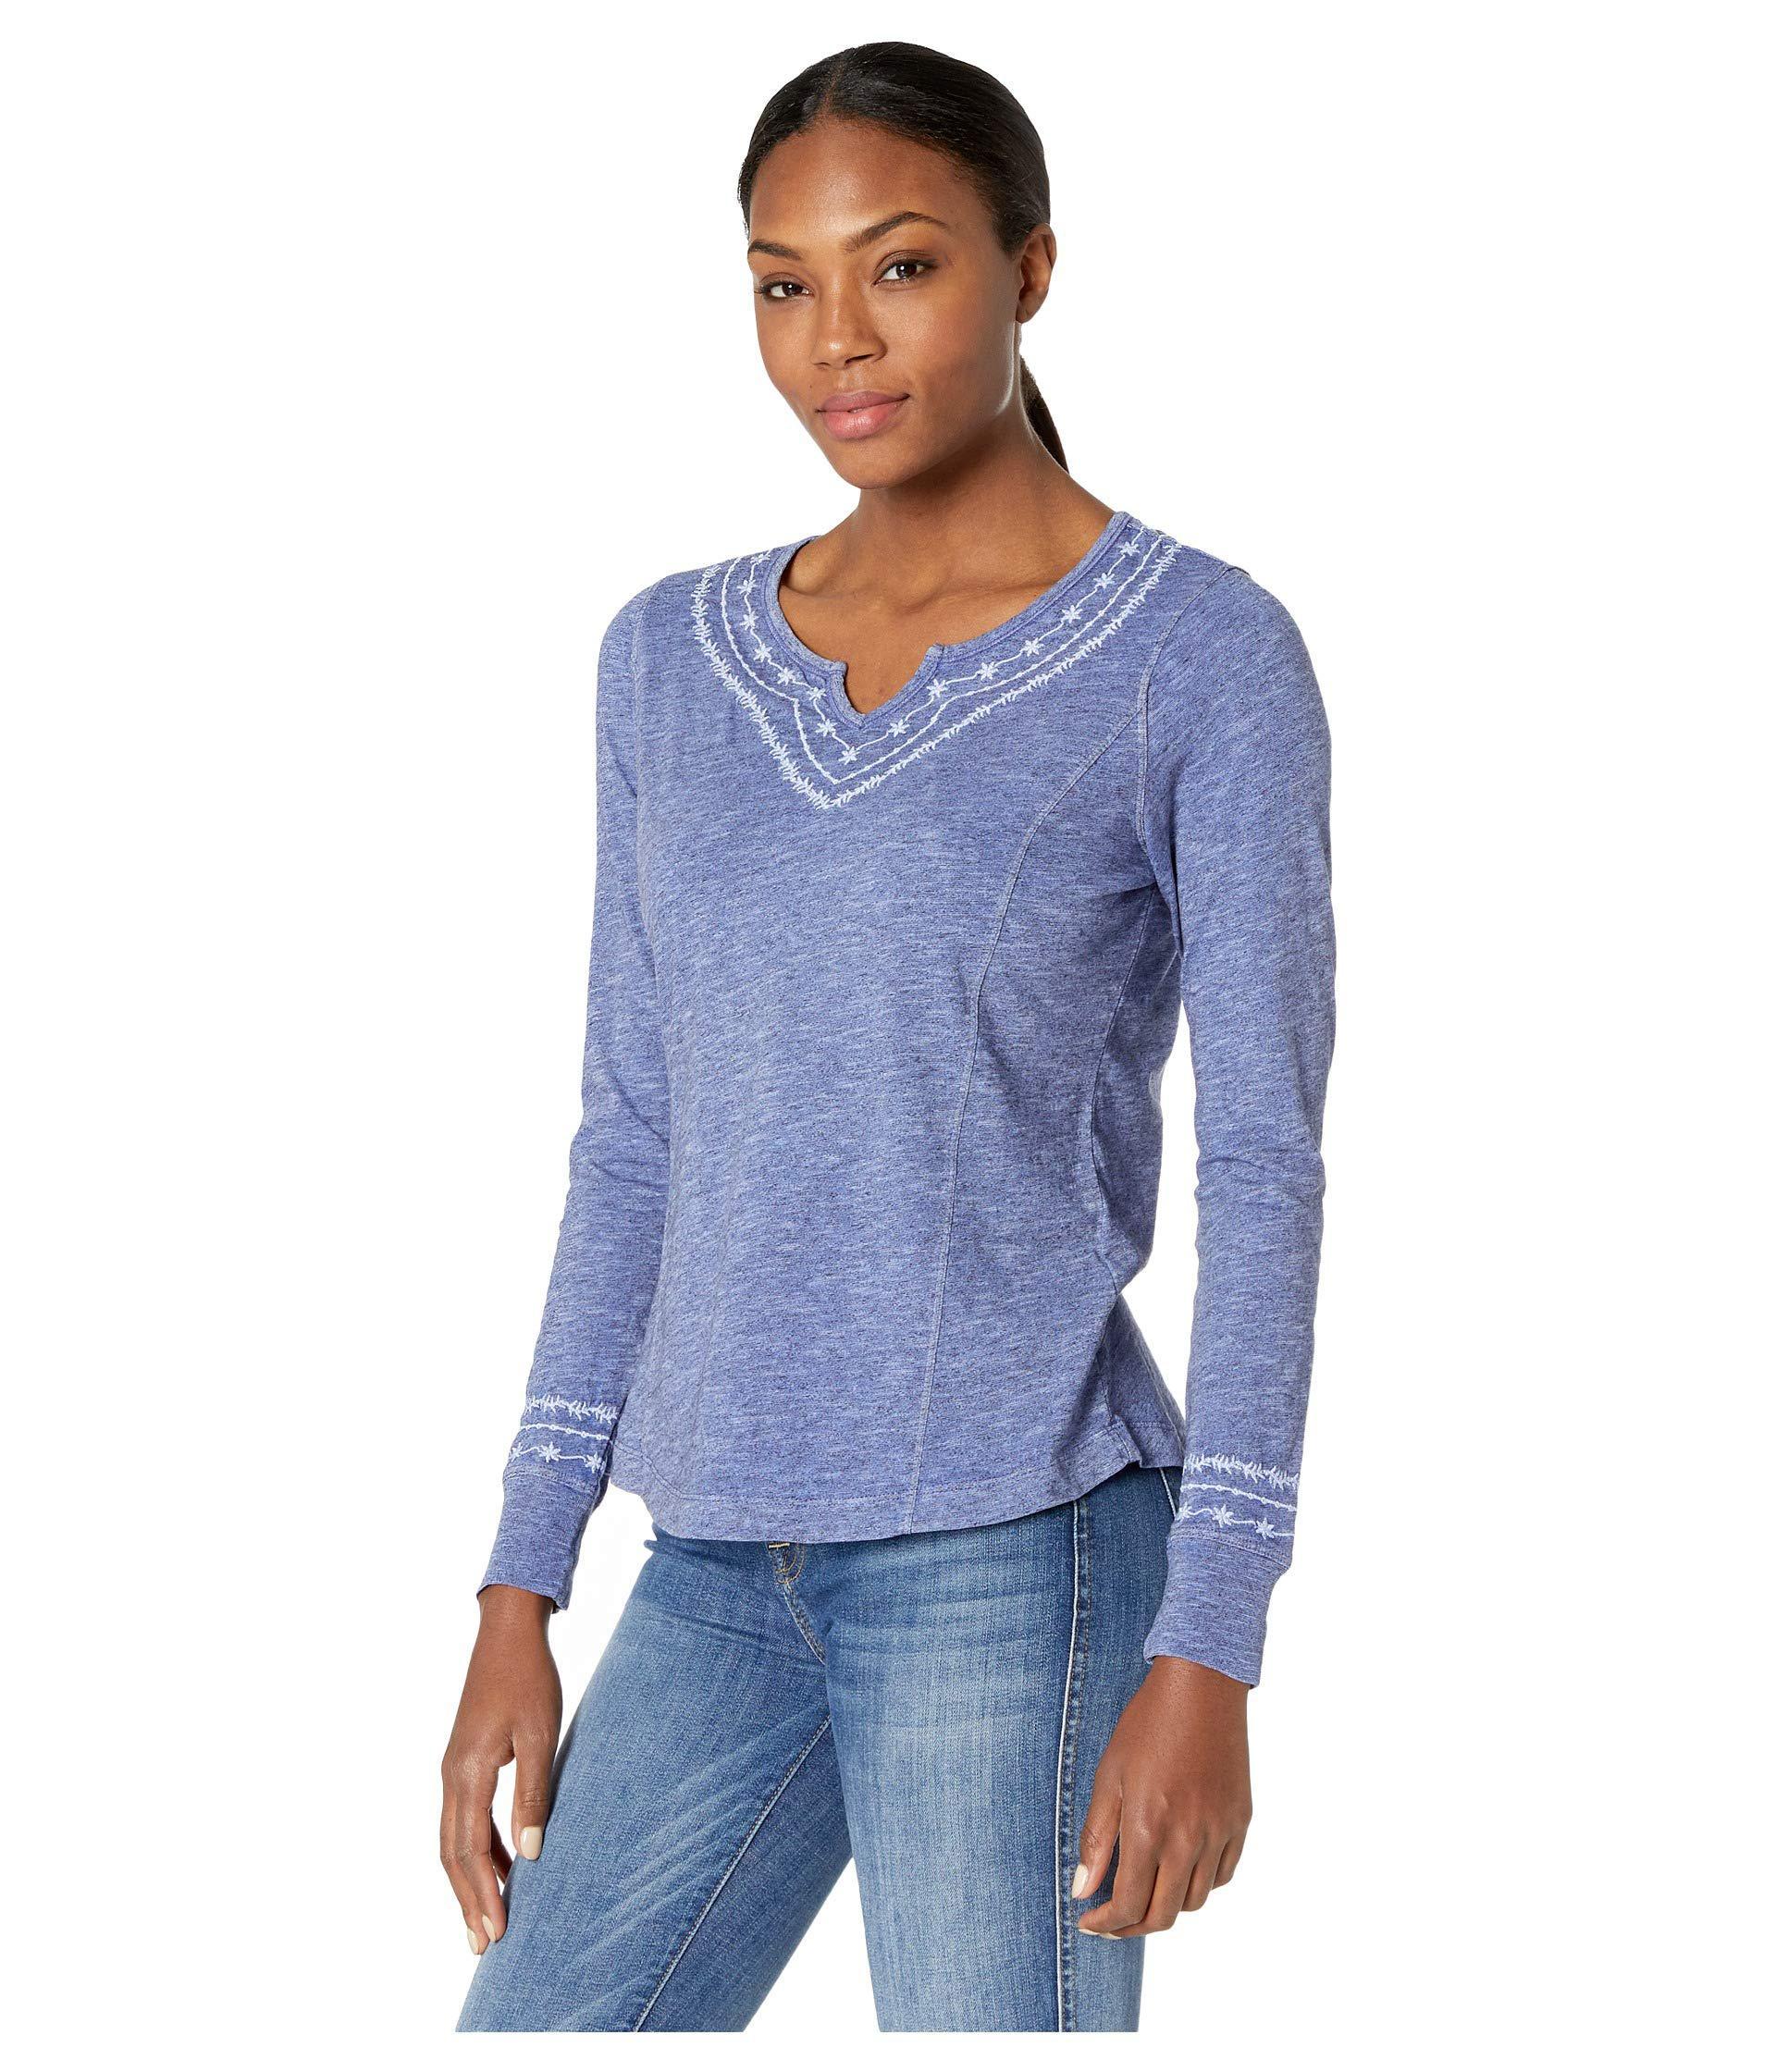 6a9b72c009f Ice Blue Womens Shirt